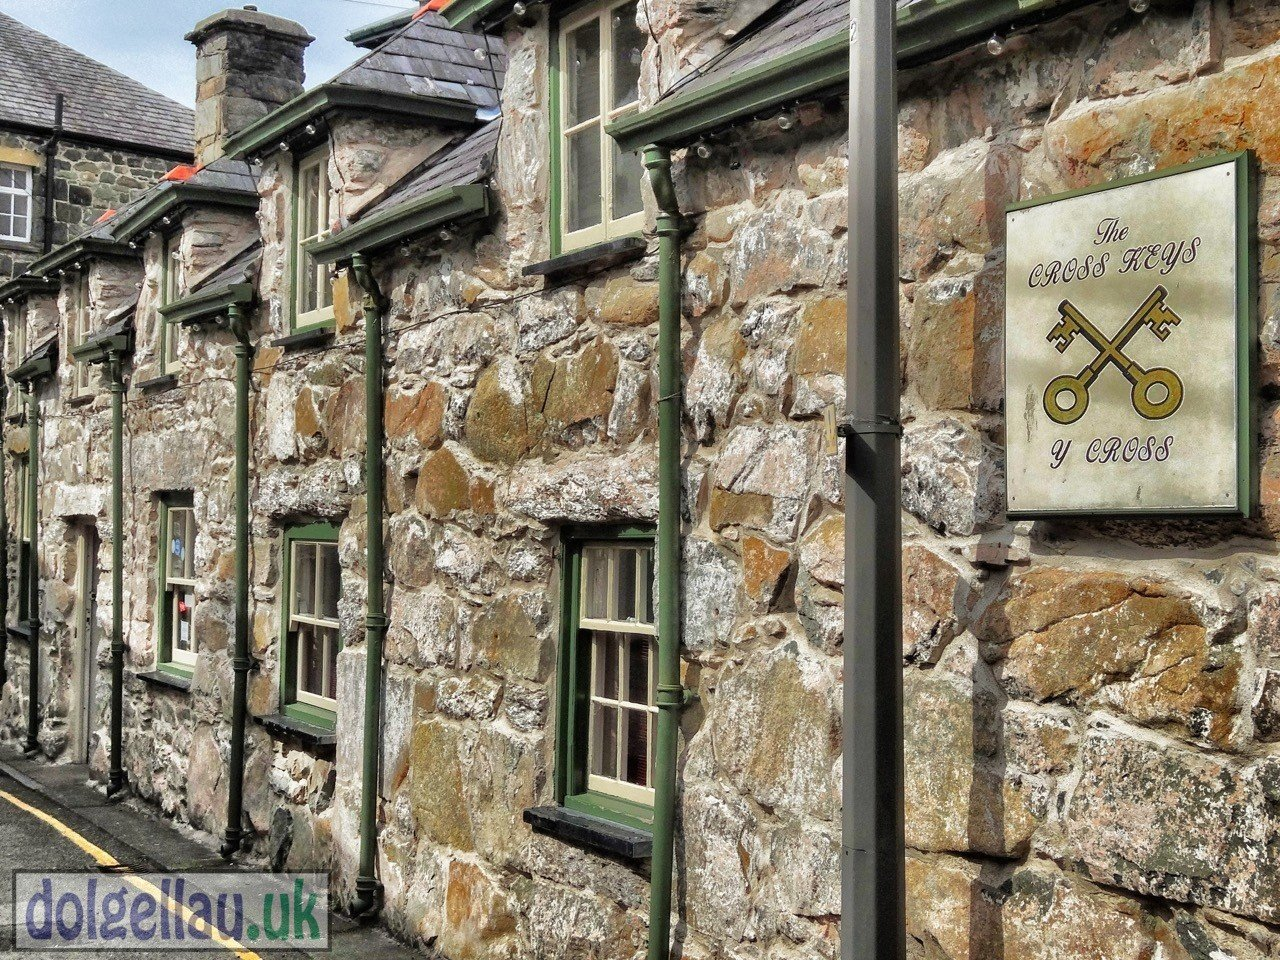 The Cross Keys Pub, Mill Street, Dolgellau